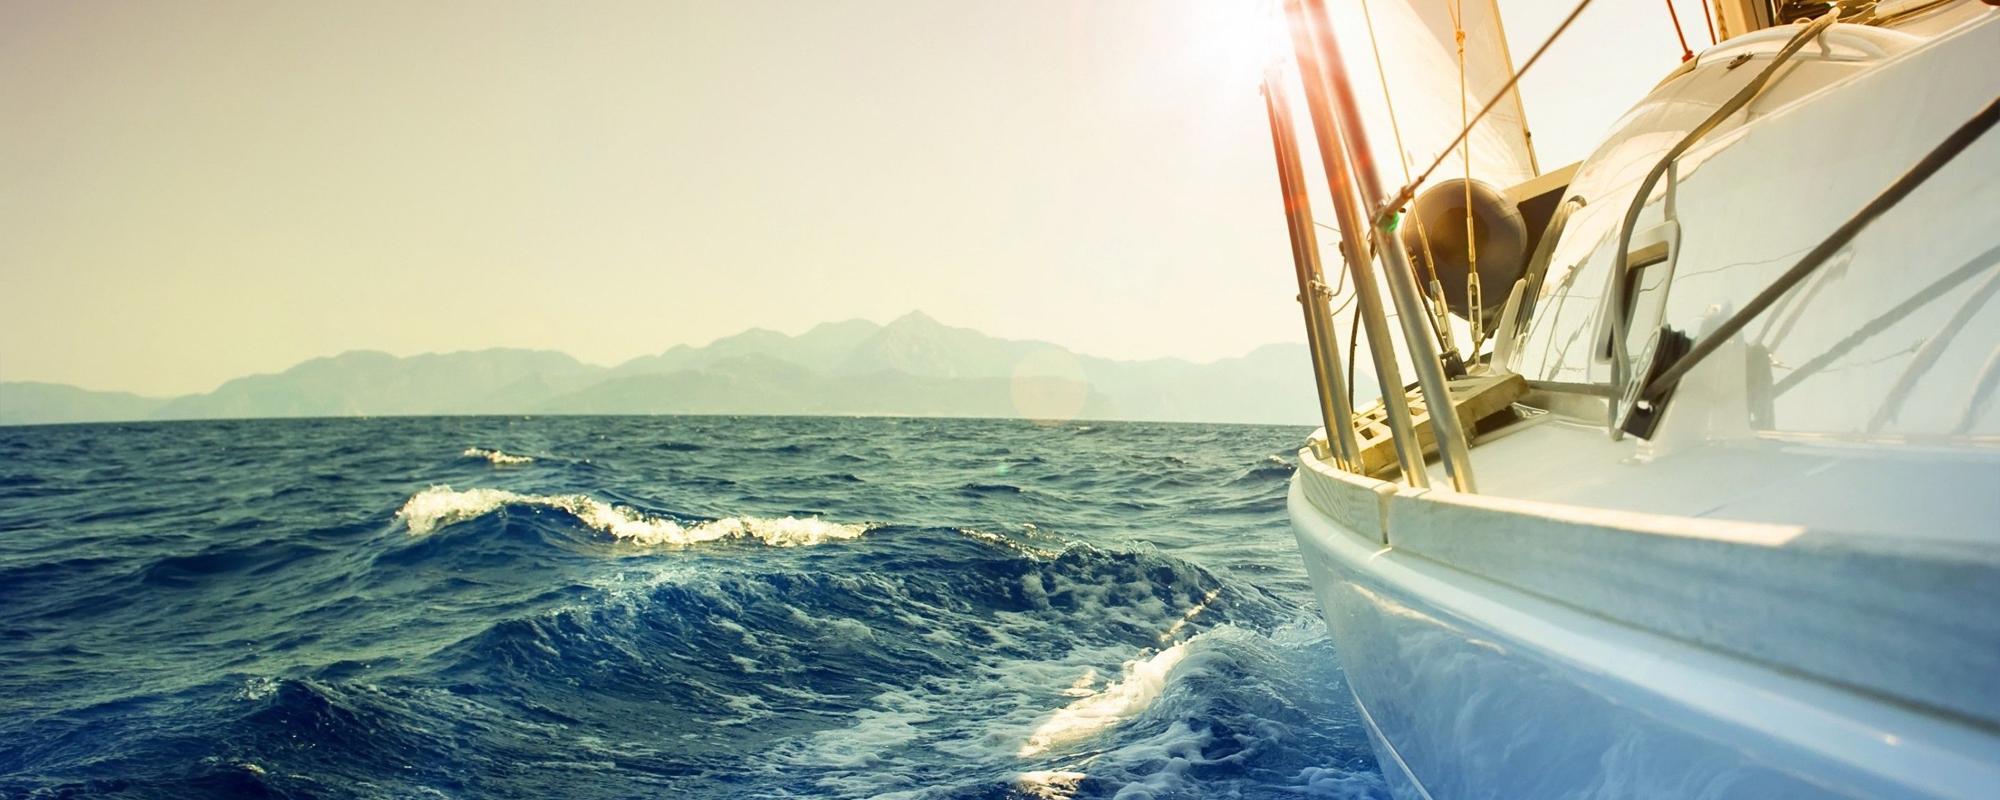 world class yachts sailing